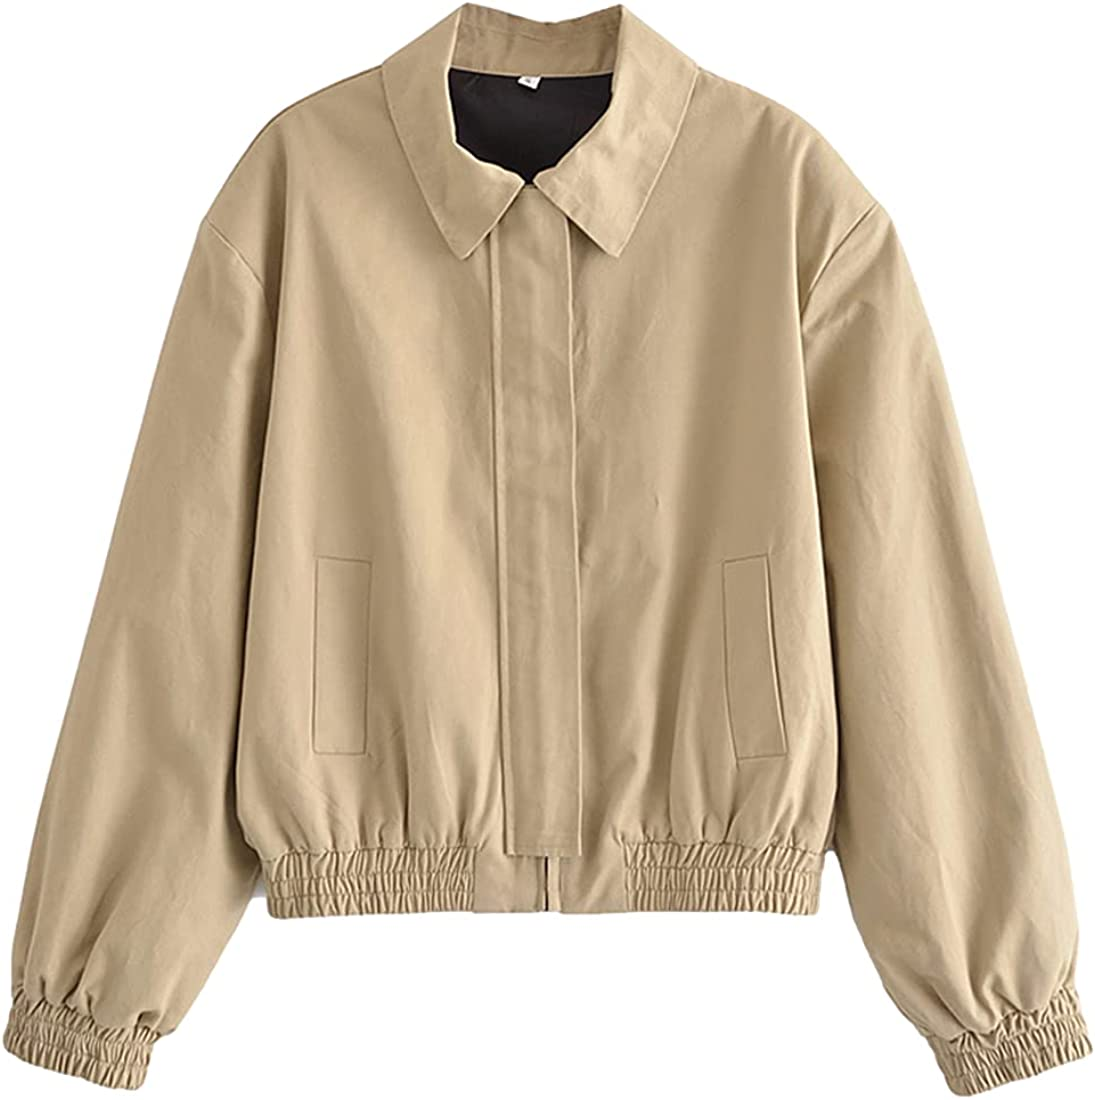 Omoone Women's Casual Jackets Zip Up Flight Bomber Lightweight Long Sleeve Softshell Coat